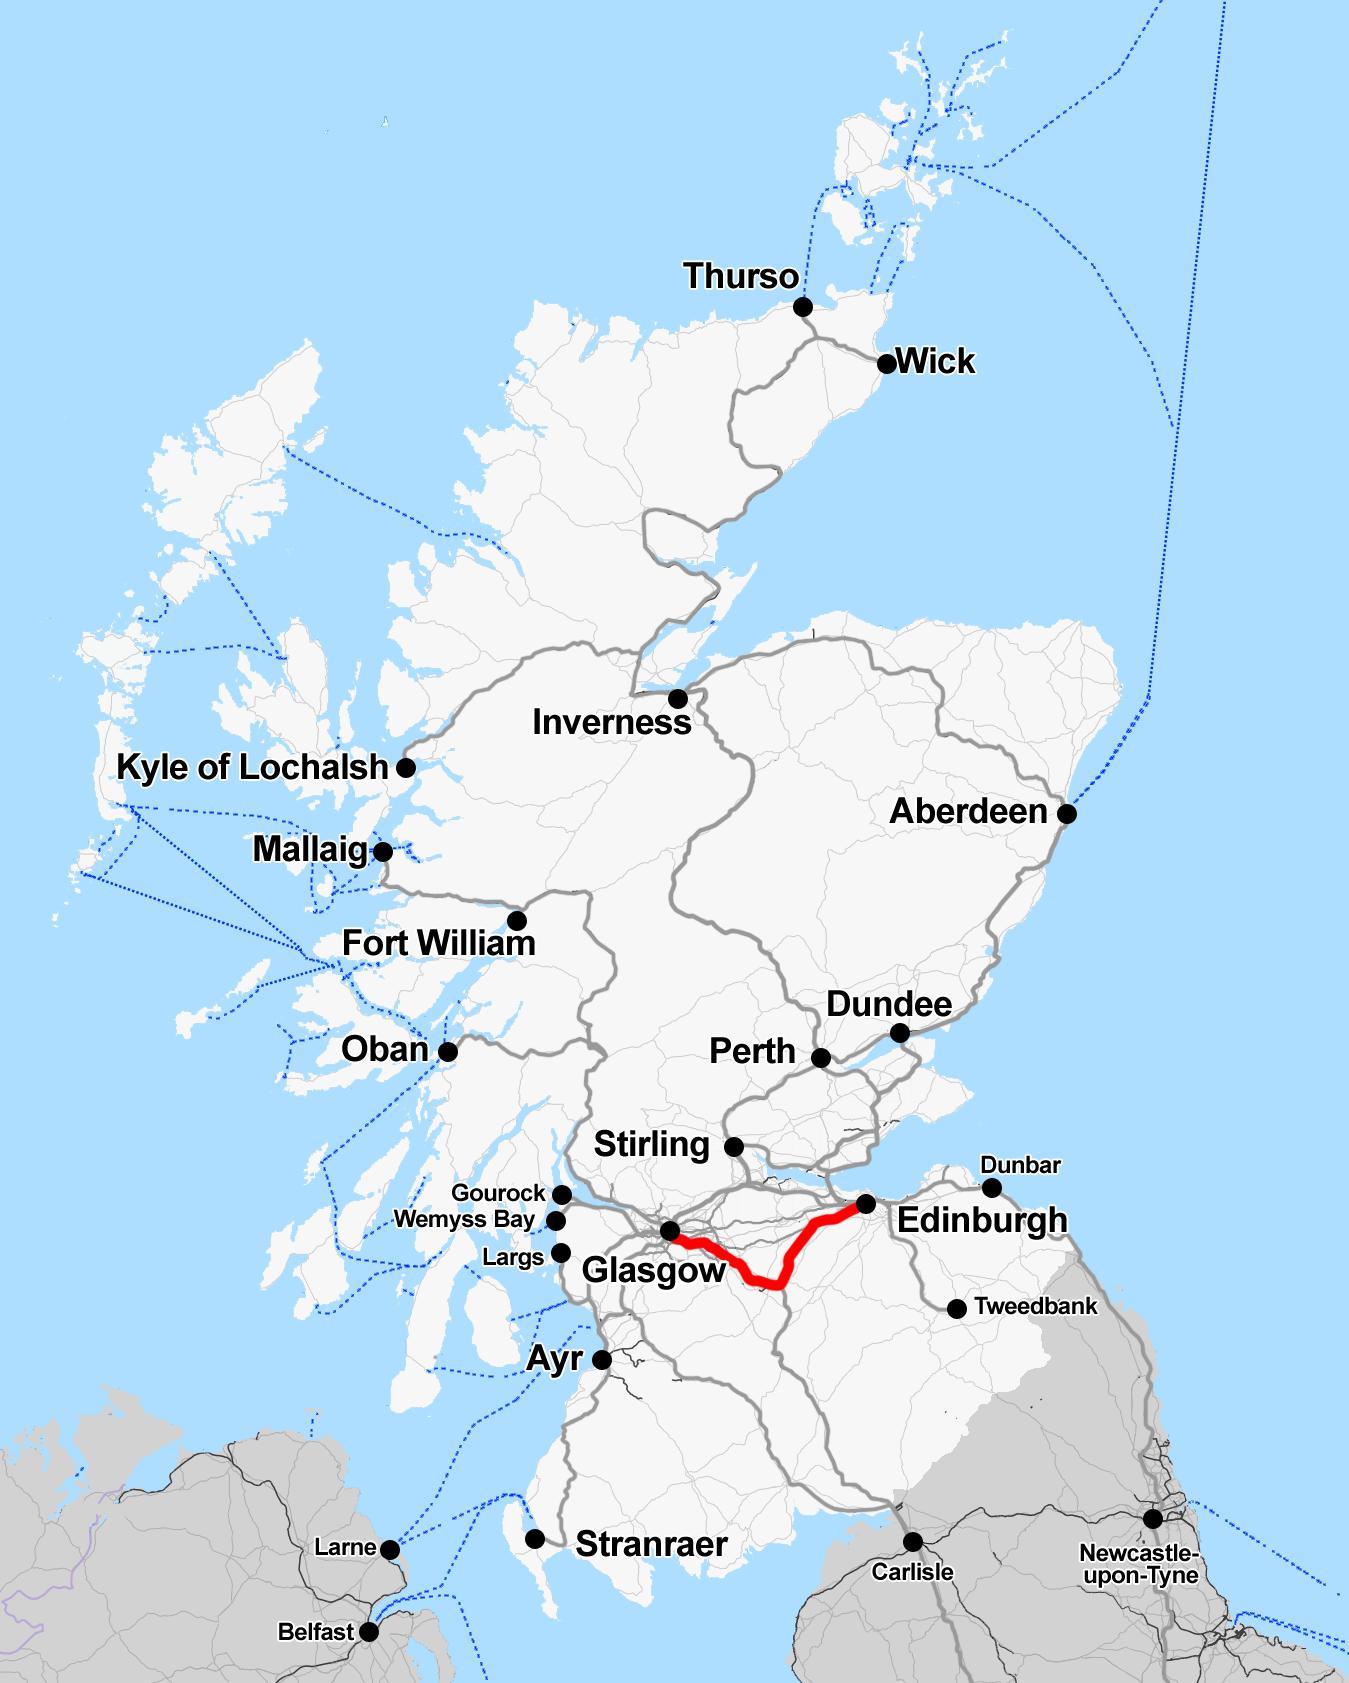 file rail map scotland glasgow edinburgh via. Black Bedroom Furniture Sets. Home Design Ideas